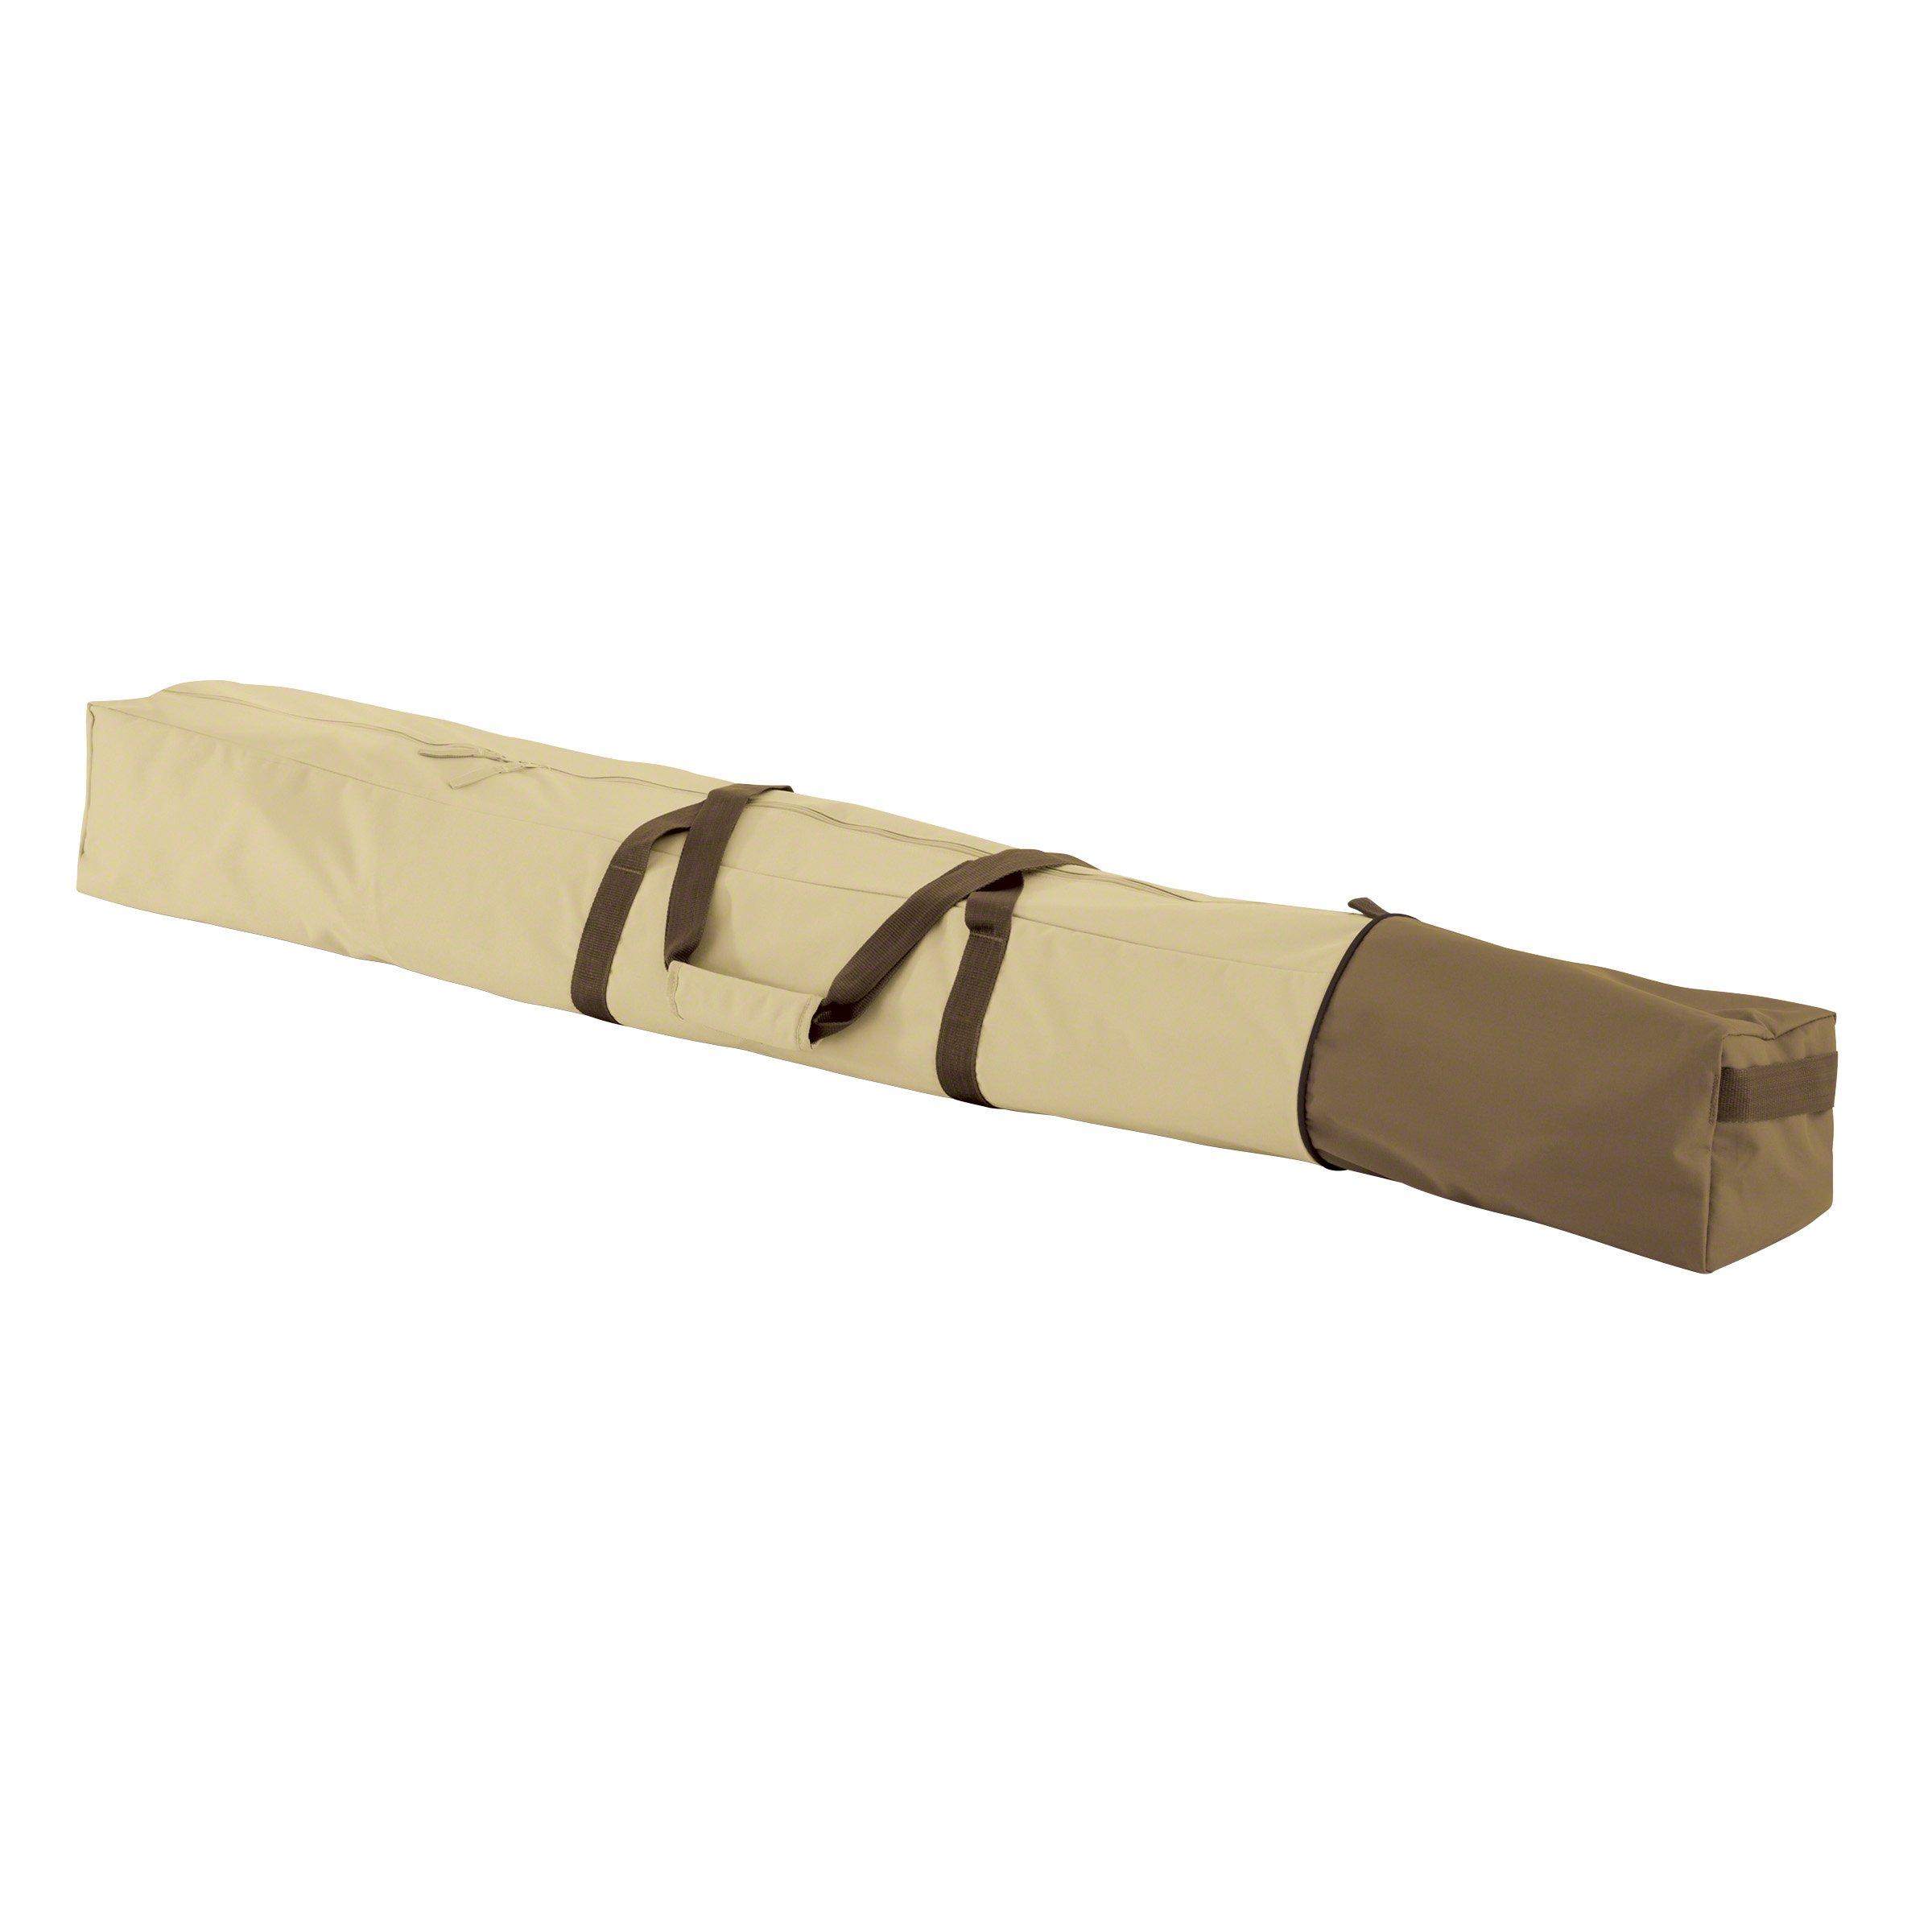 Classic Accessories Veranda Patio Umbrella Storage And Carrying Bag by Classic Accessories